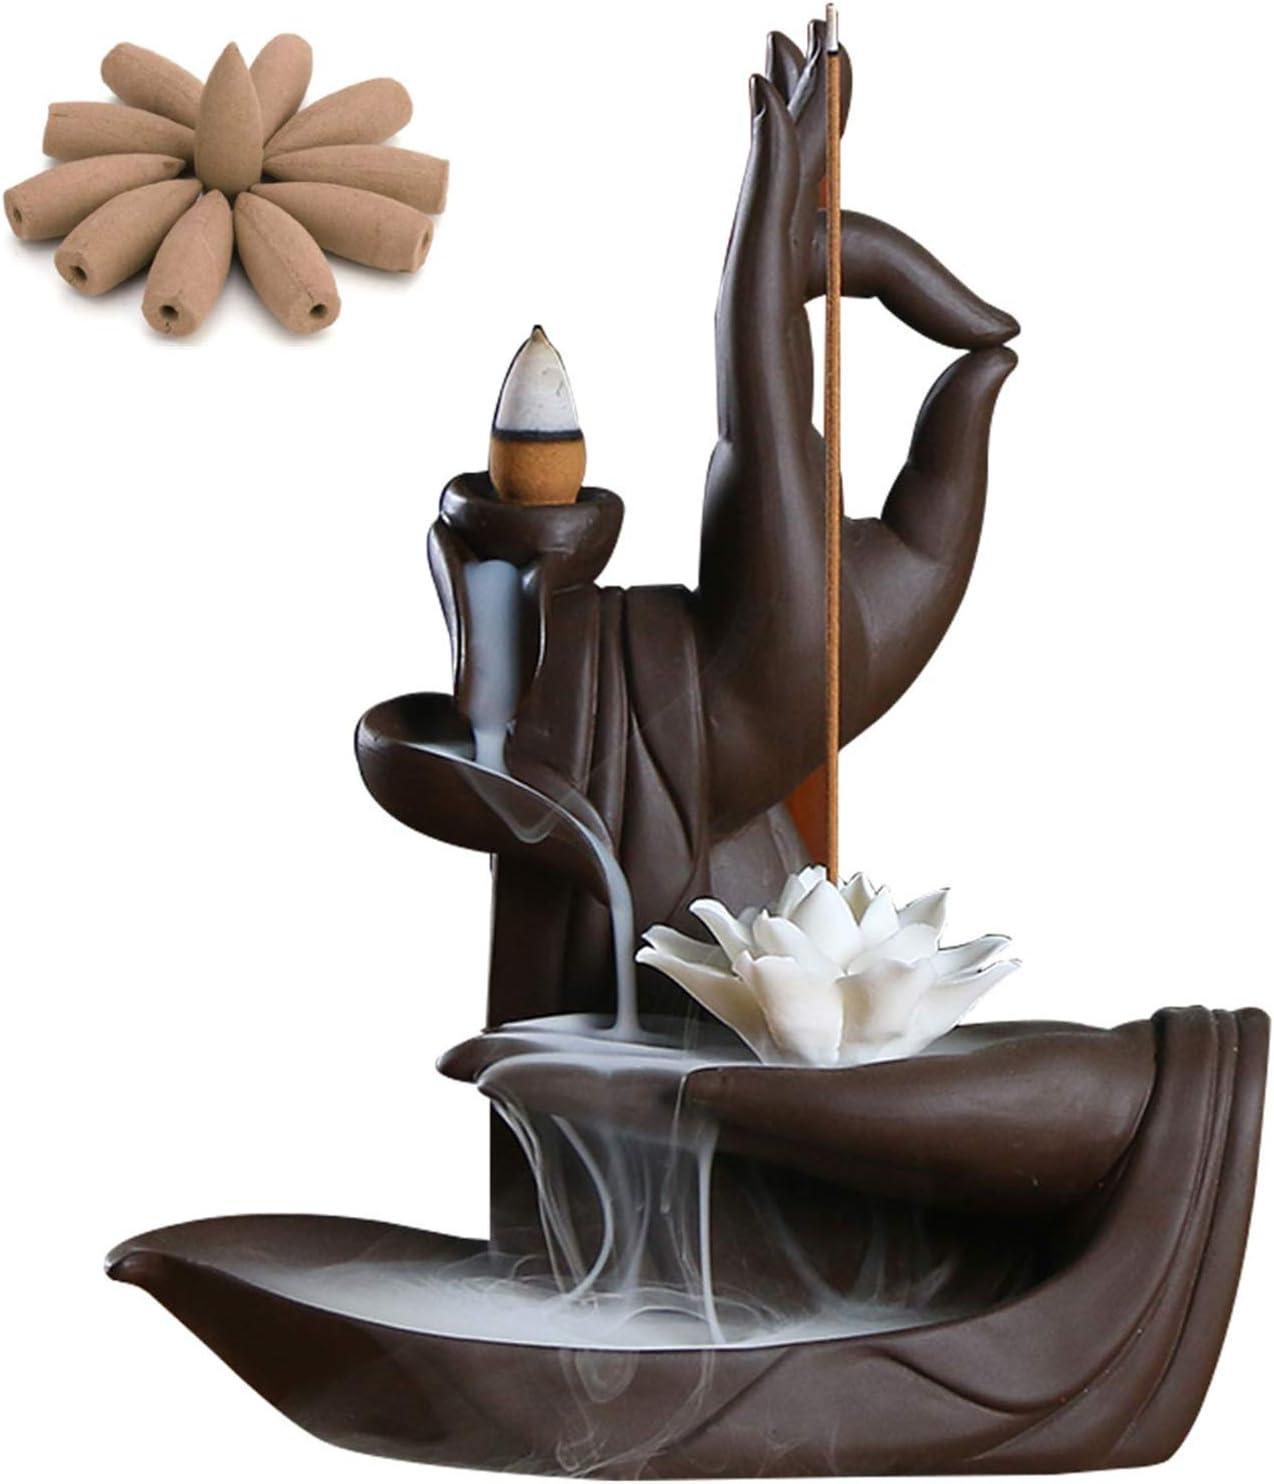 Backflow Incense Holder Burner Handmade Ceramic Incense Cones Sticks Holder Home Decor Waterfall Backflow Incense Burner Censer + 10 Backflow Incense Cones Gift (Lotus)